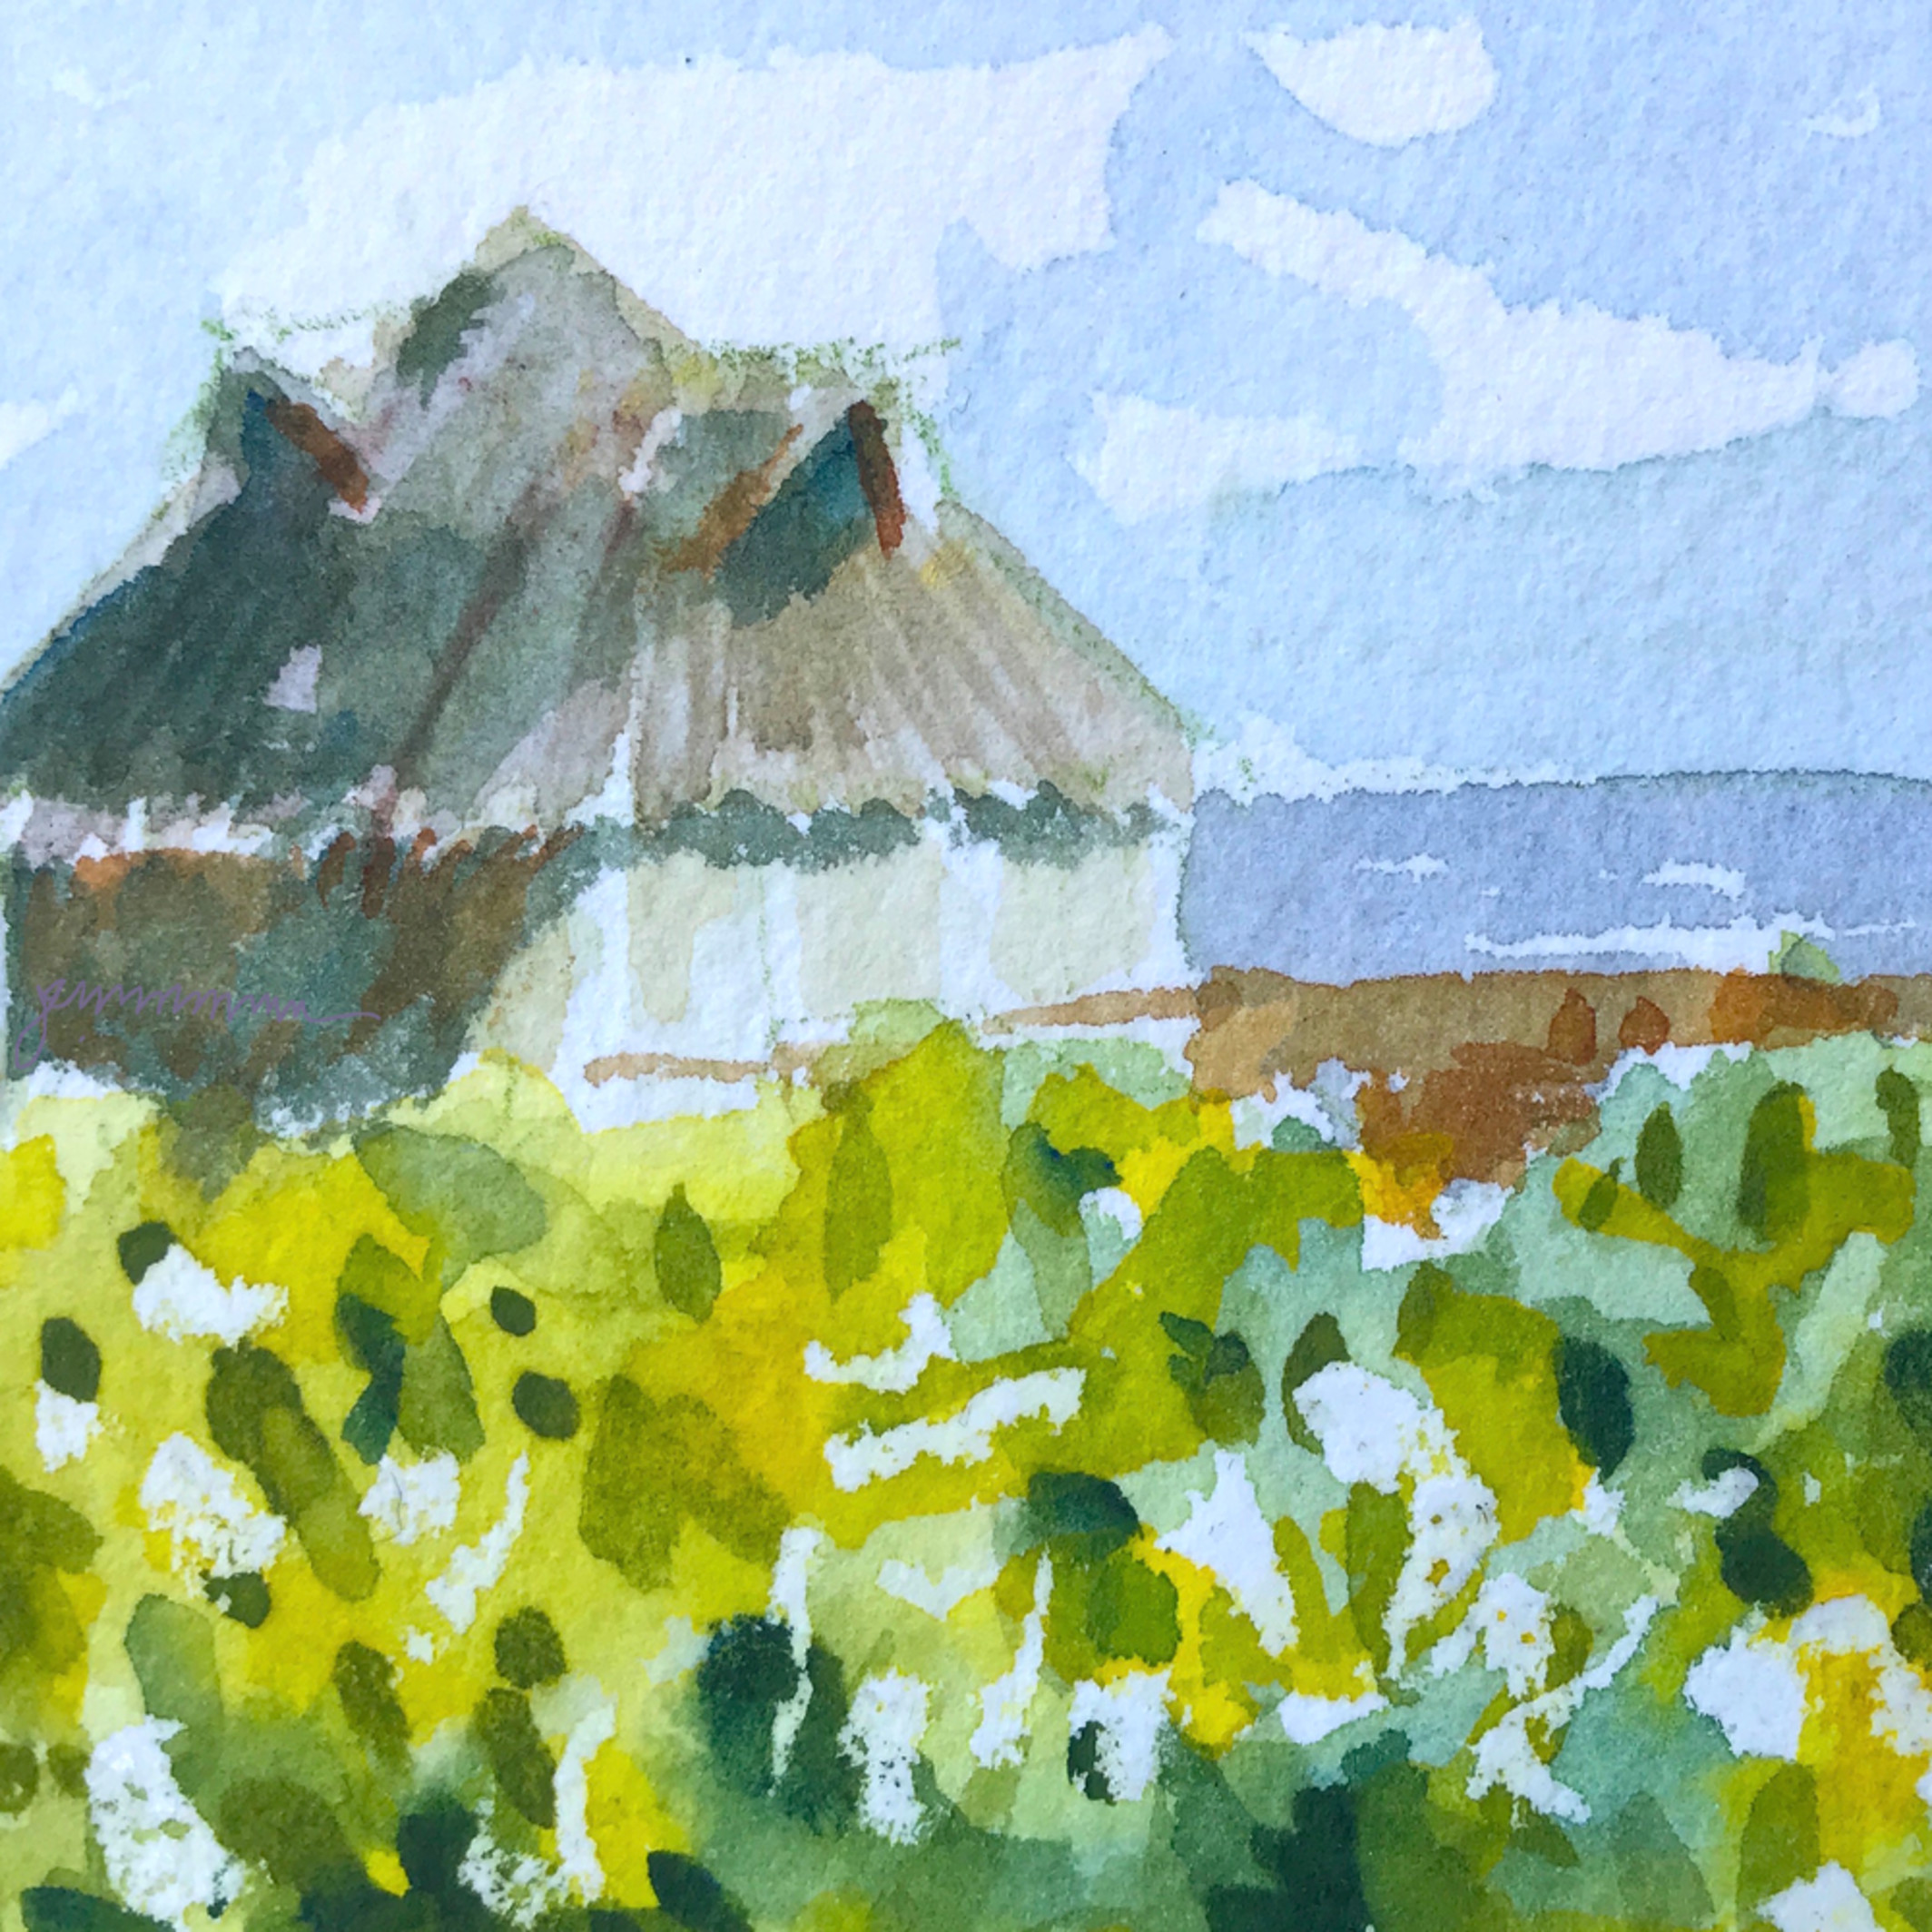 Tropical bungalow  jmmason sig lge rmouj9